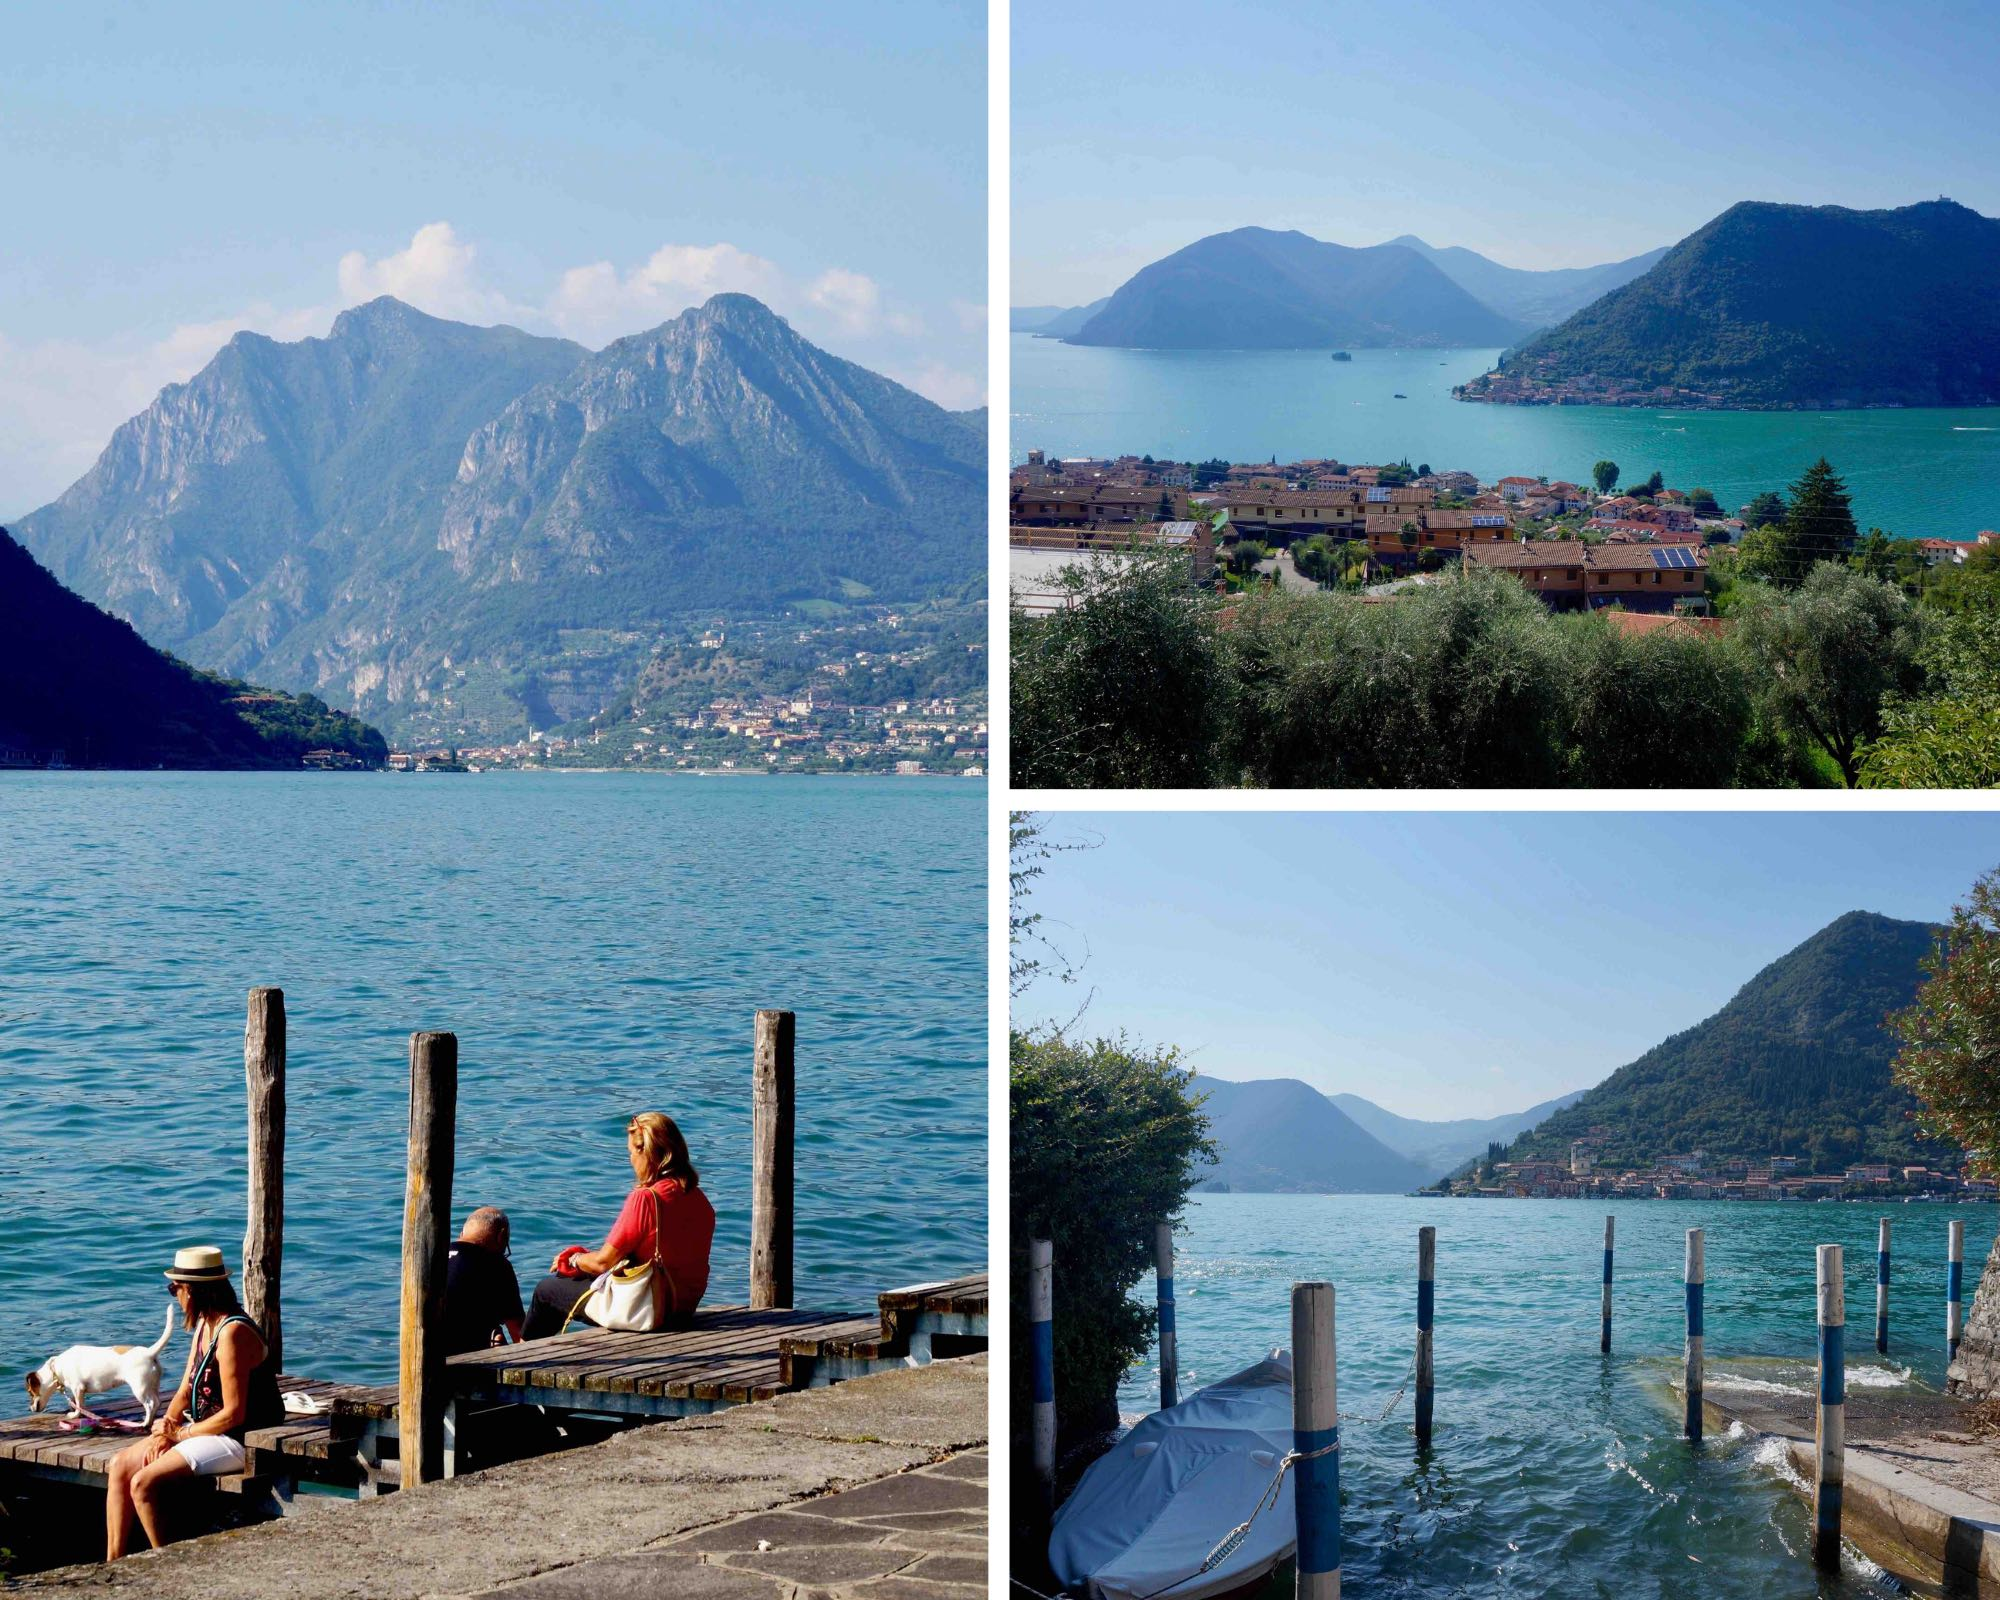 lago d'iseo, italie